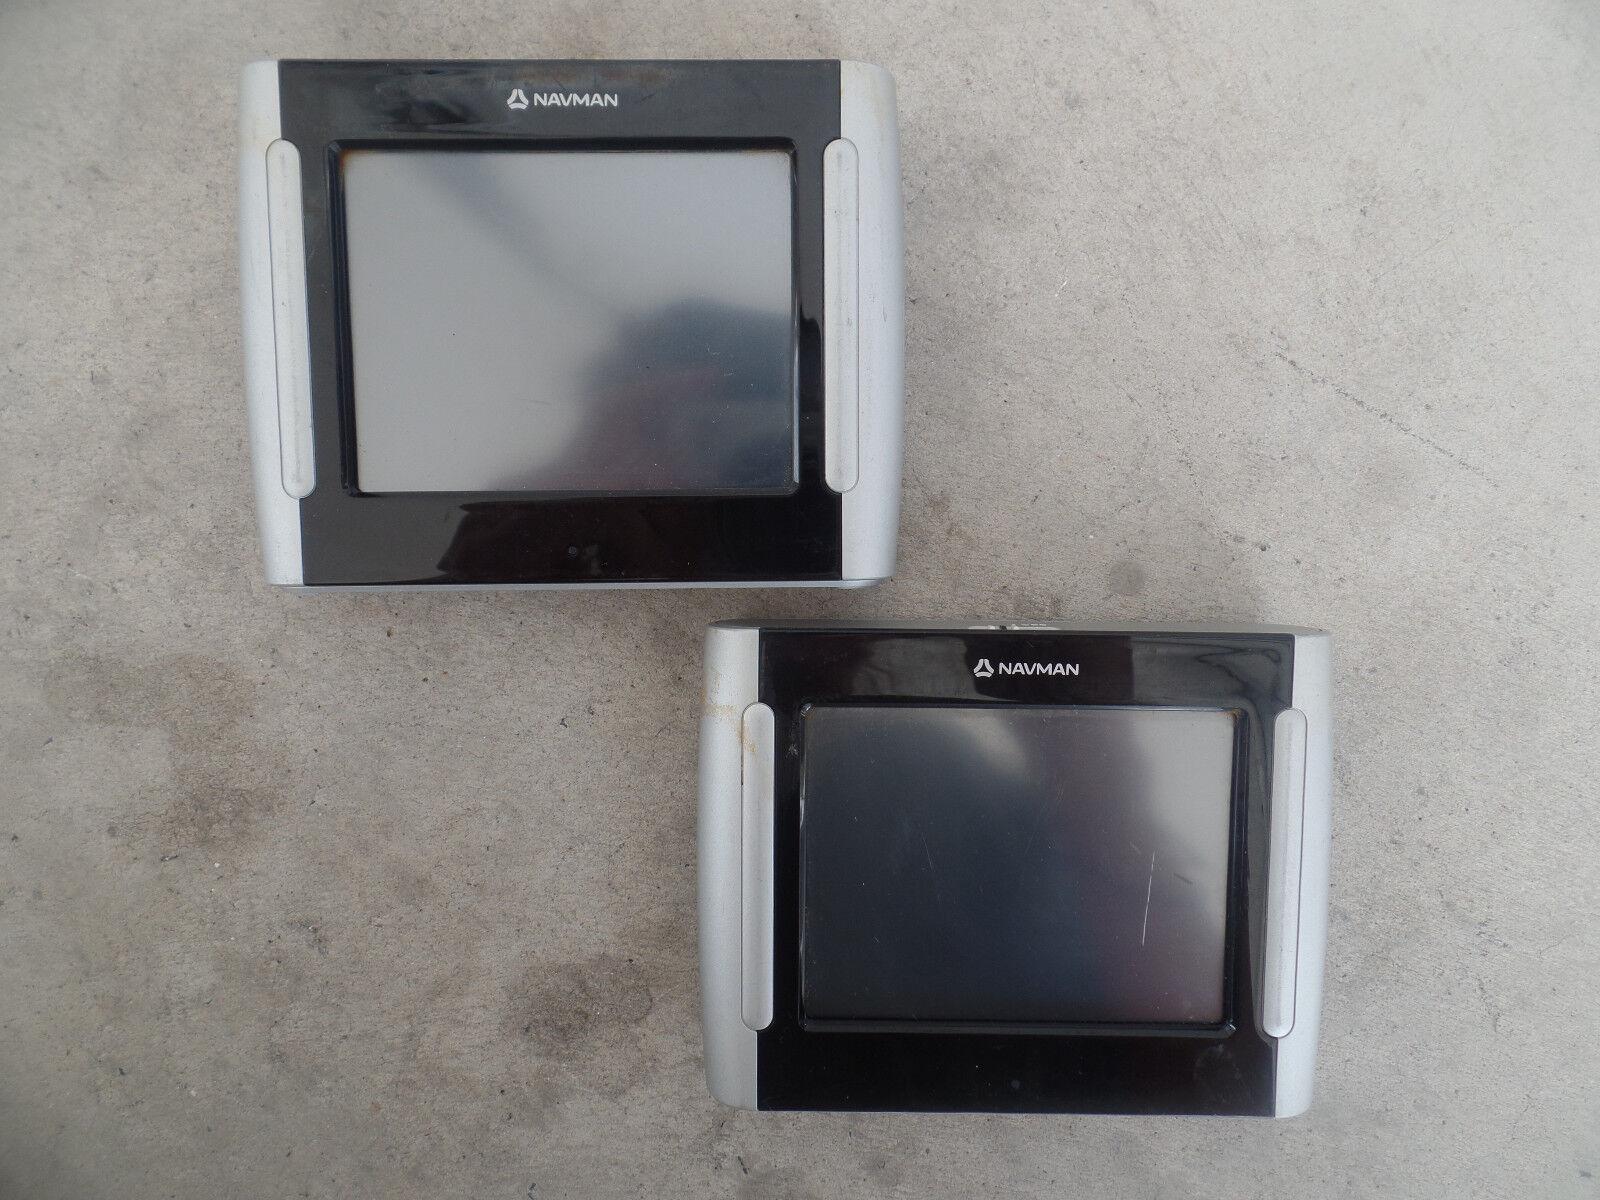 2 x USED Faulty NAVMAN N196 GPS Automotive GPS - NO POWER